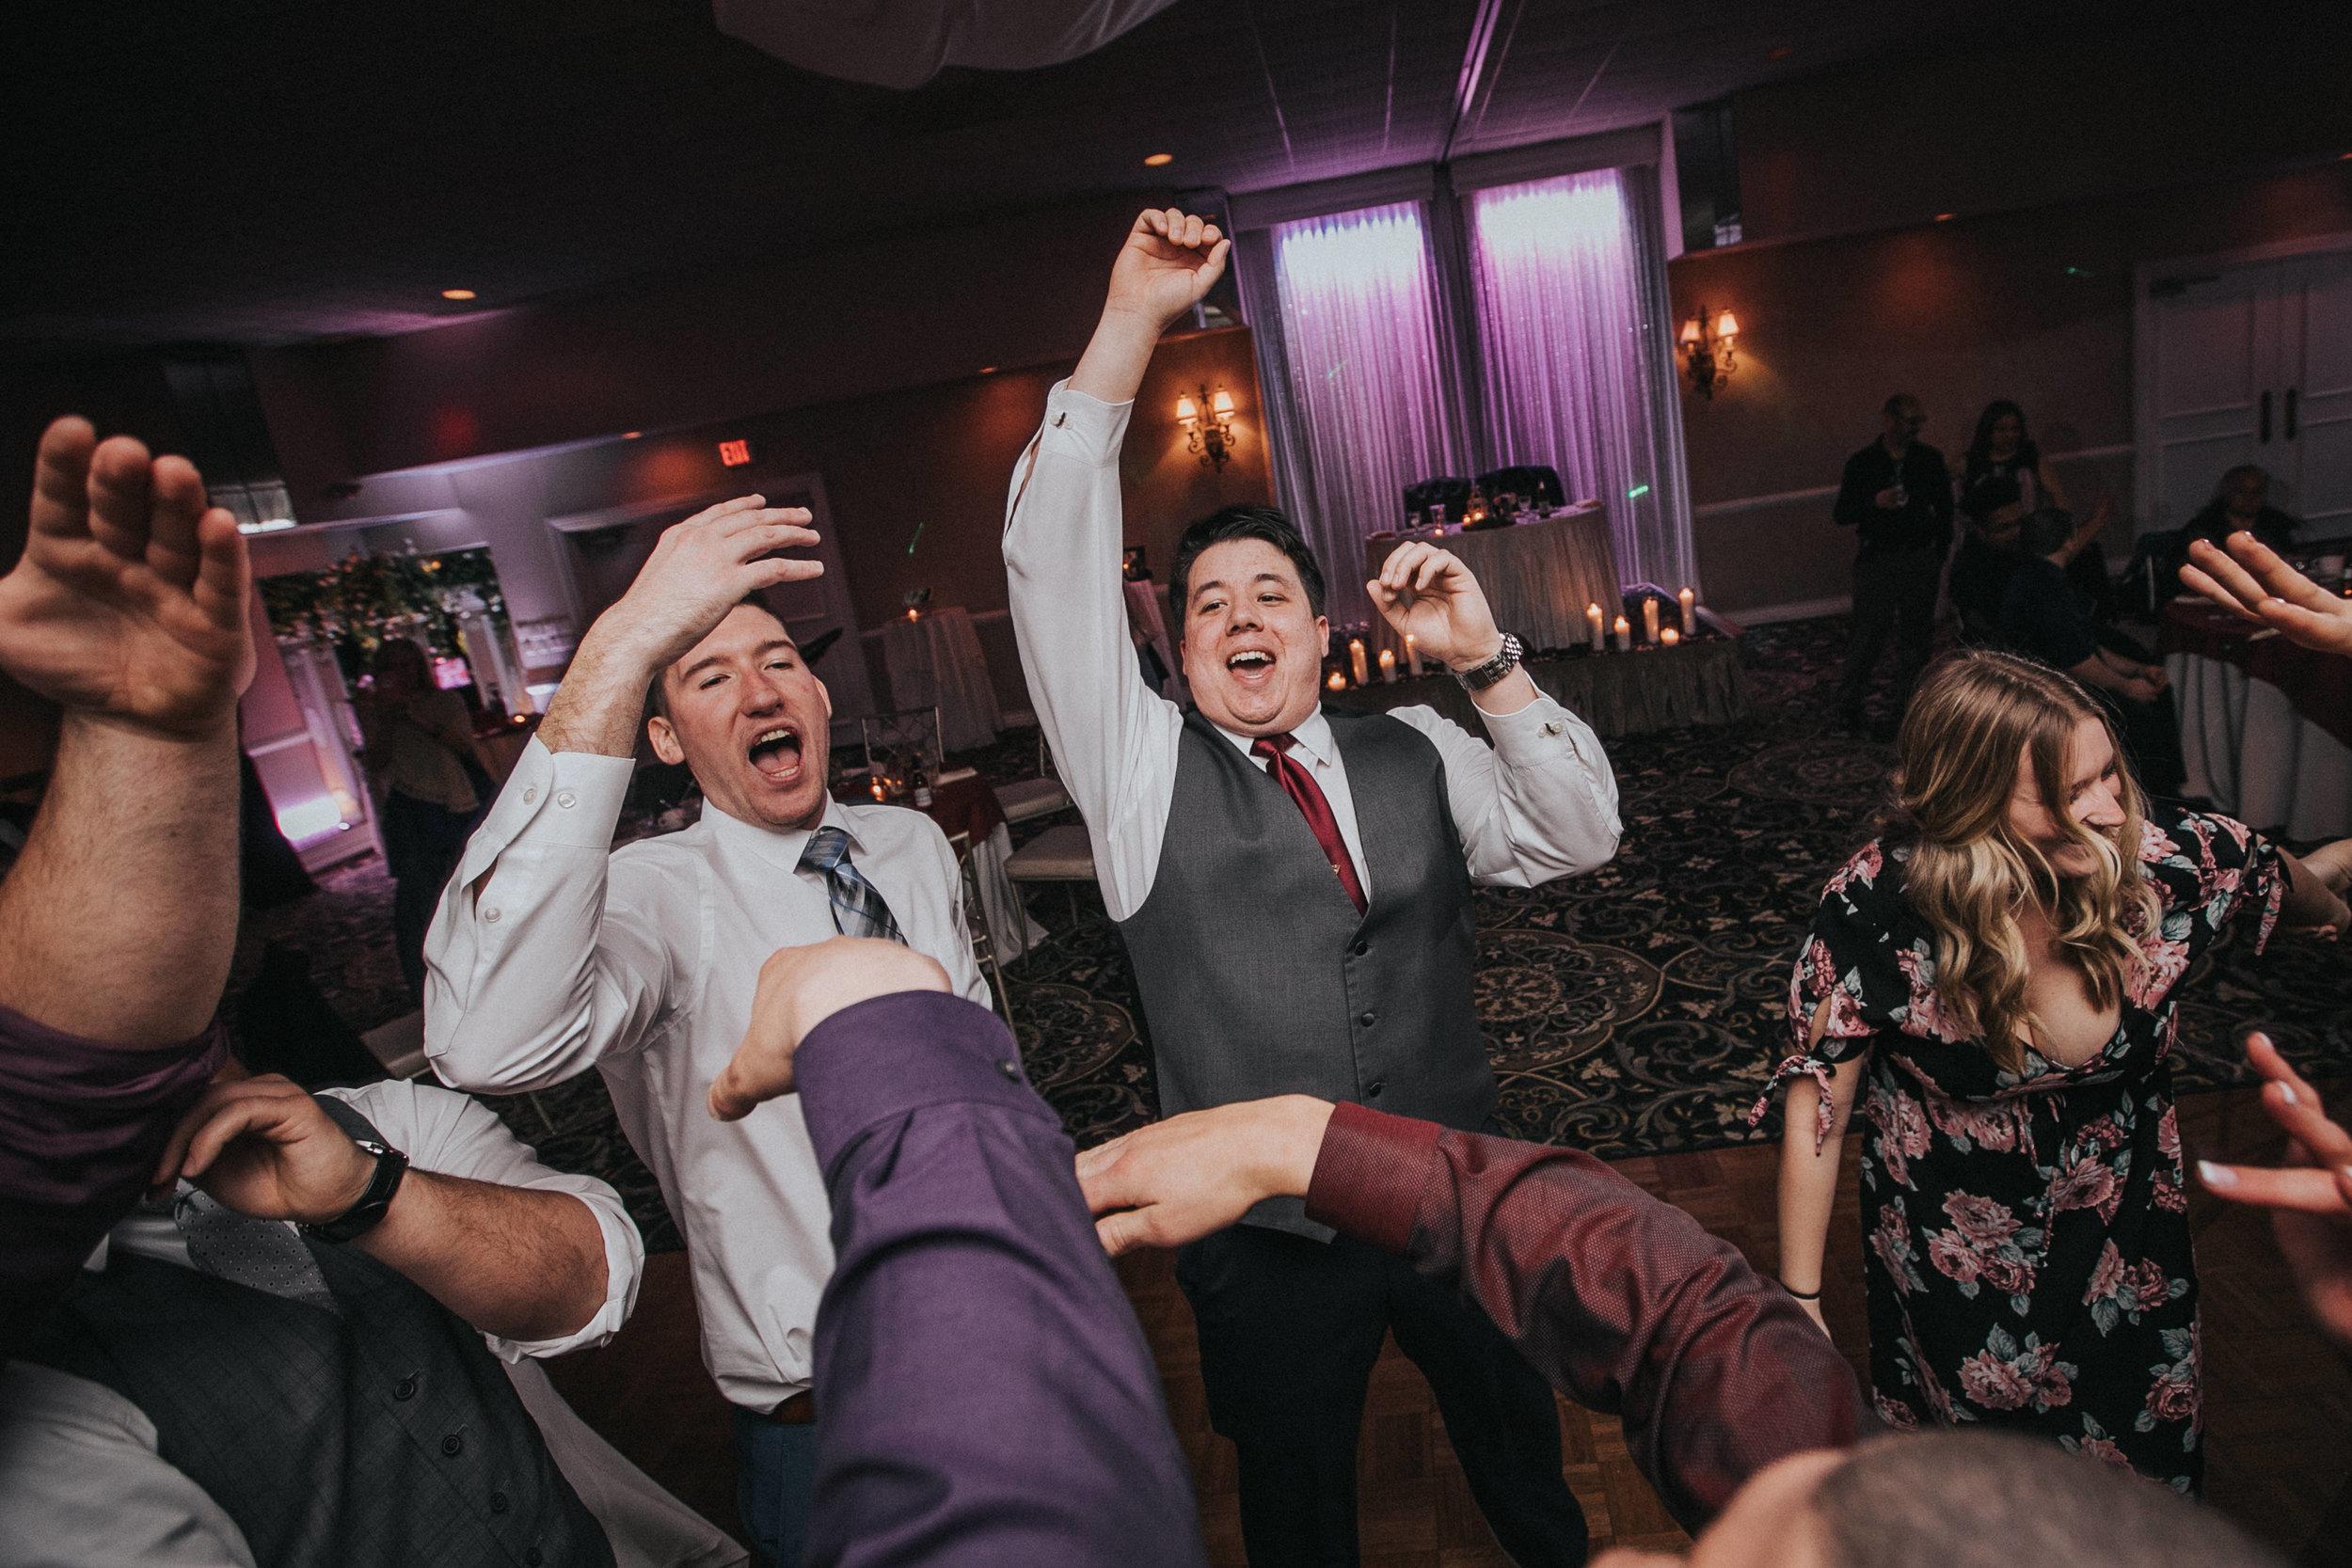 New-Jersey-Wedding-Photographer-ReceptionCenter-Valeria&Mike-Reception (219 of 265).jpg